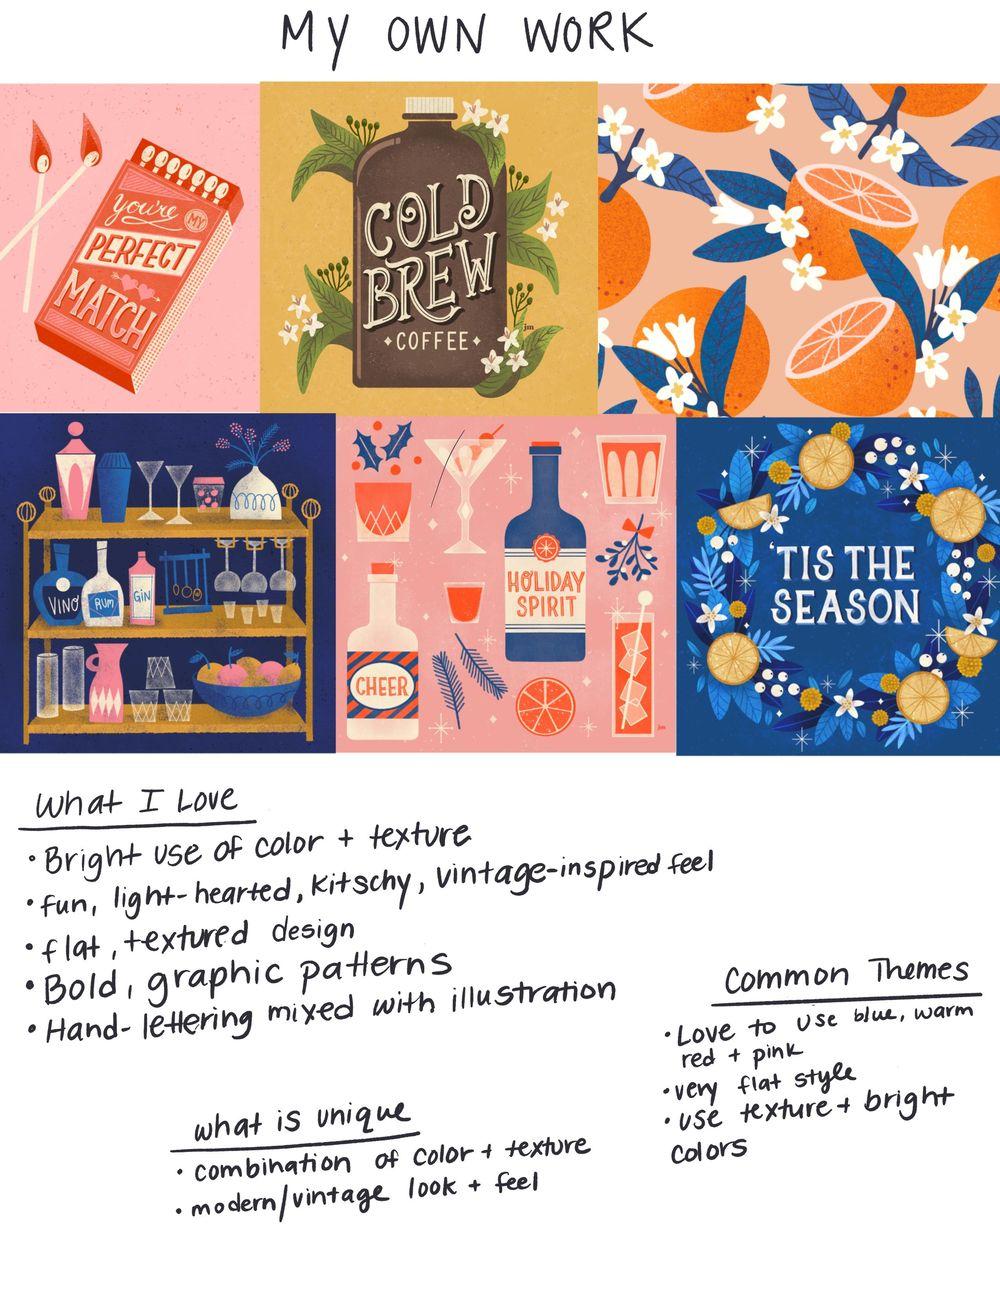 Illustration Style Exploration - image 3 - student project